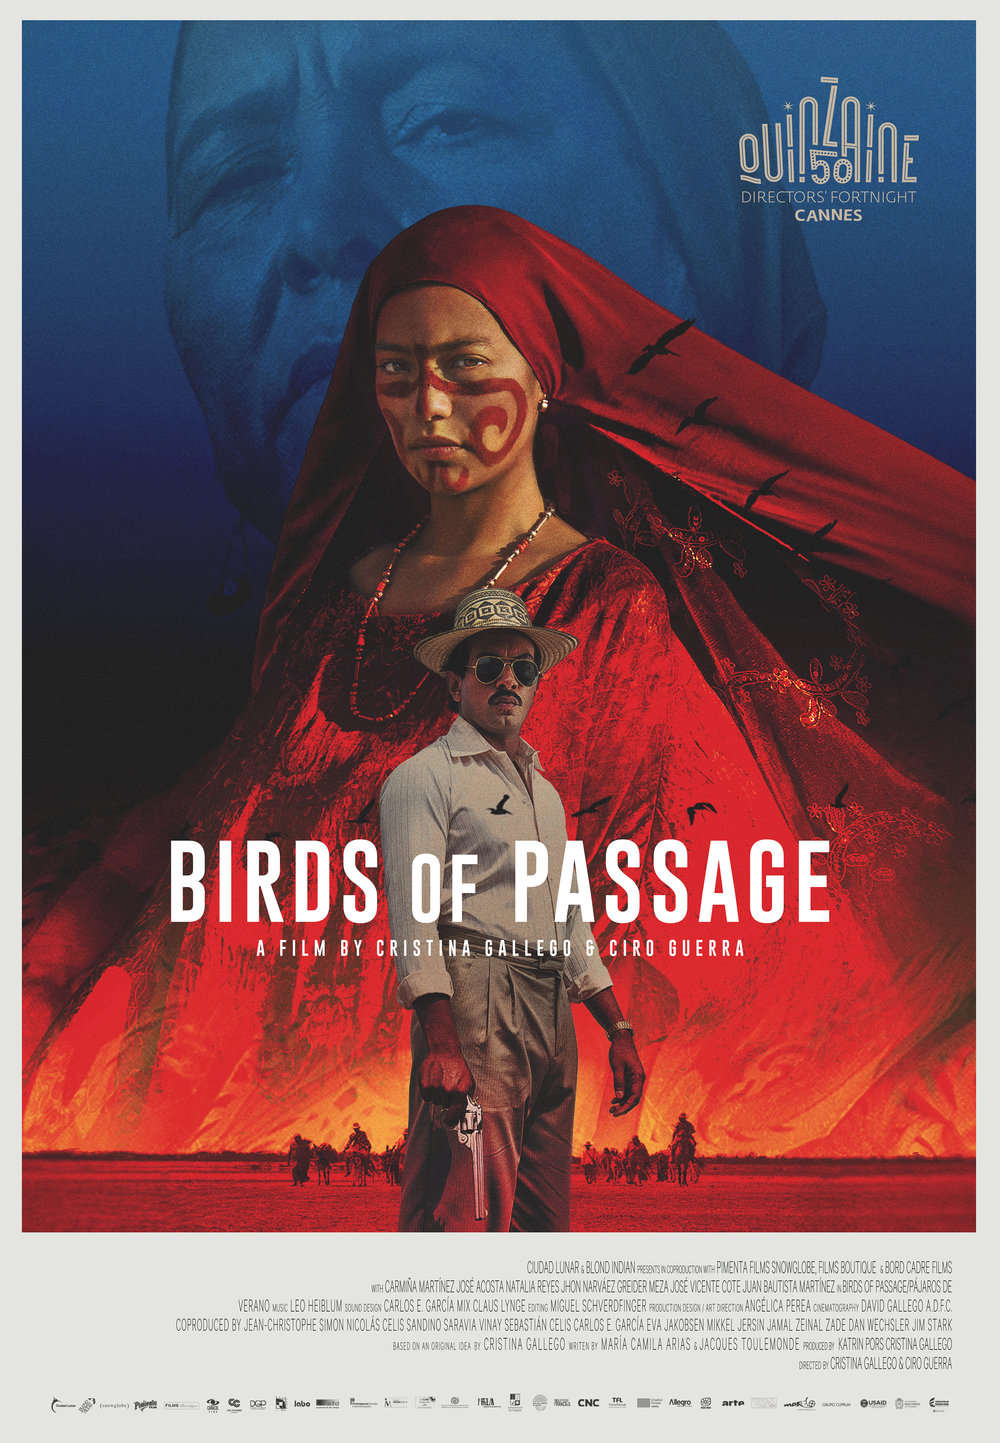 birdsofpassage_poster.jpg